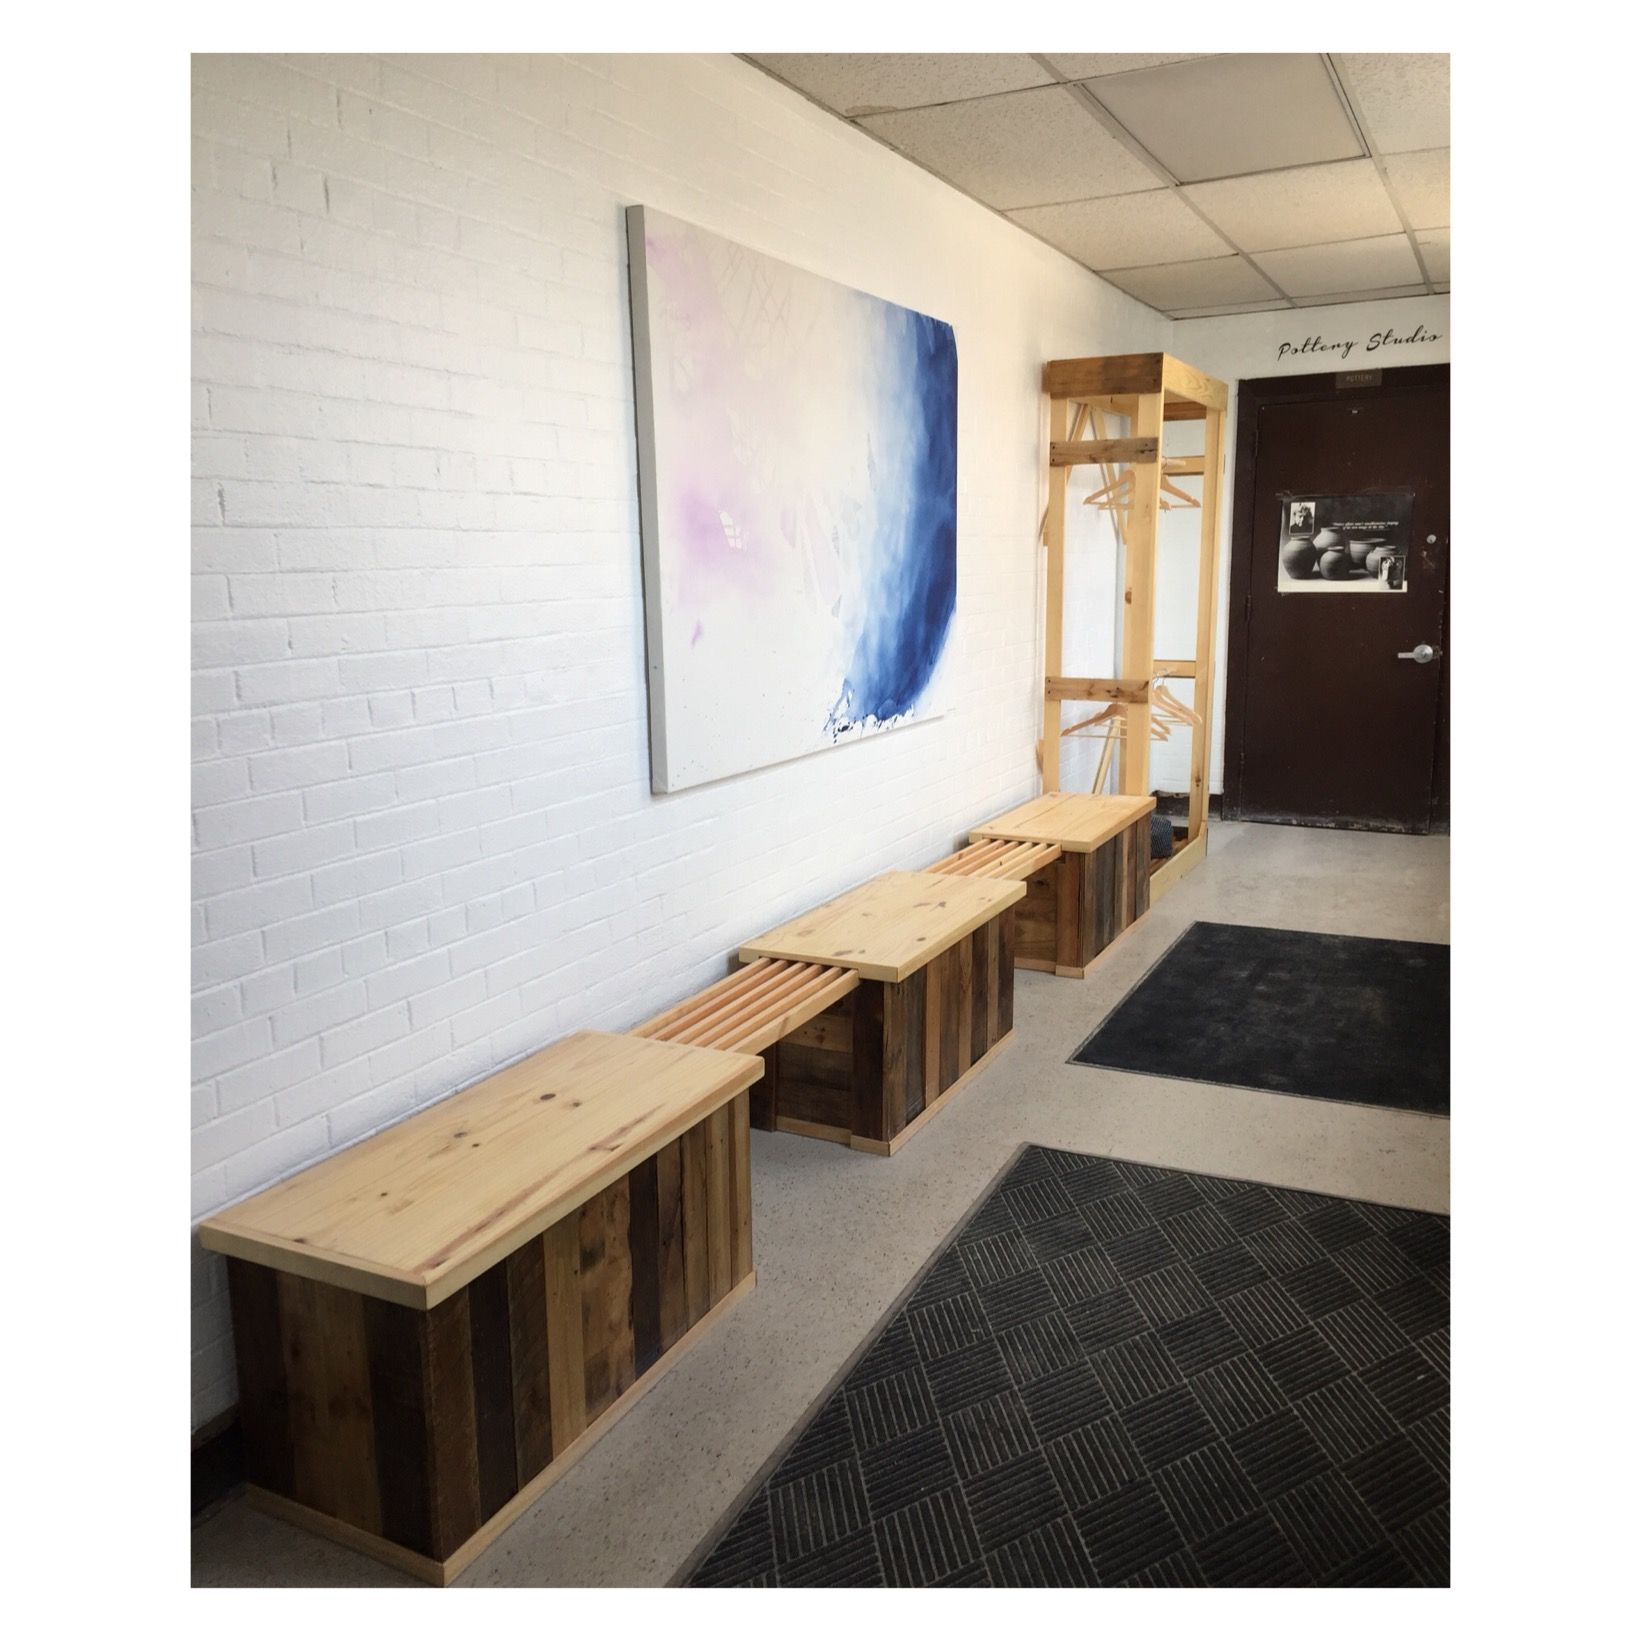 "Benches, Large 4x6 ft Painting, Coatrack, Vinyl ""Pottery Studio"""